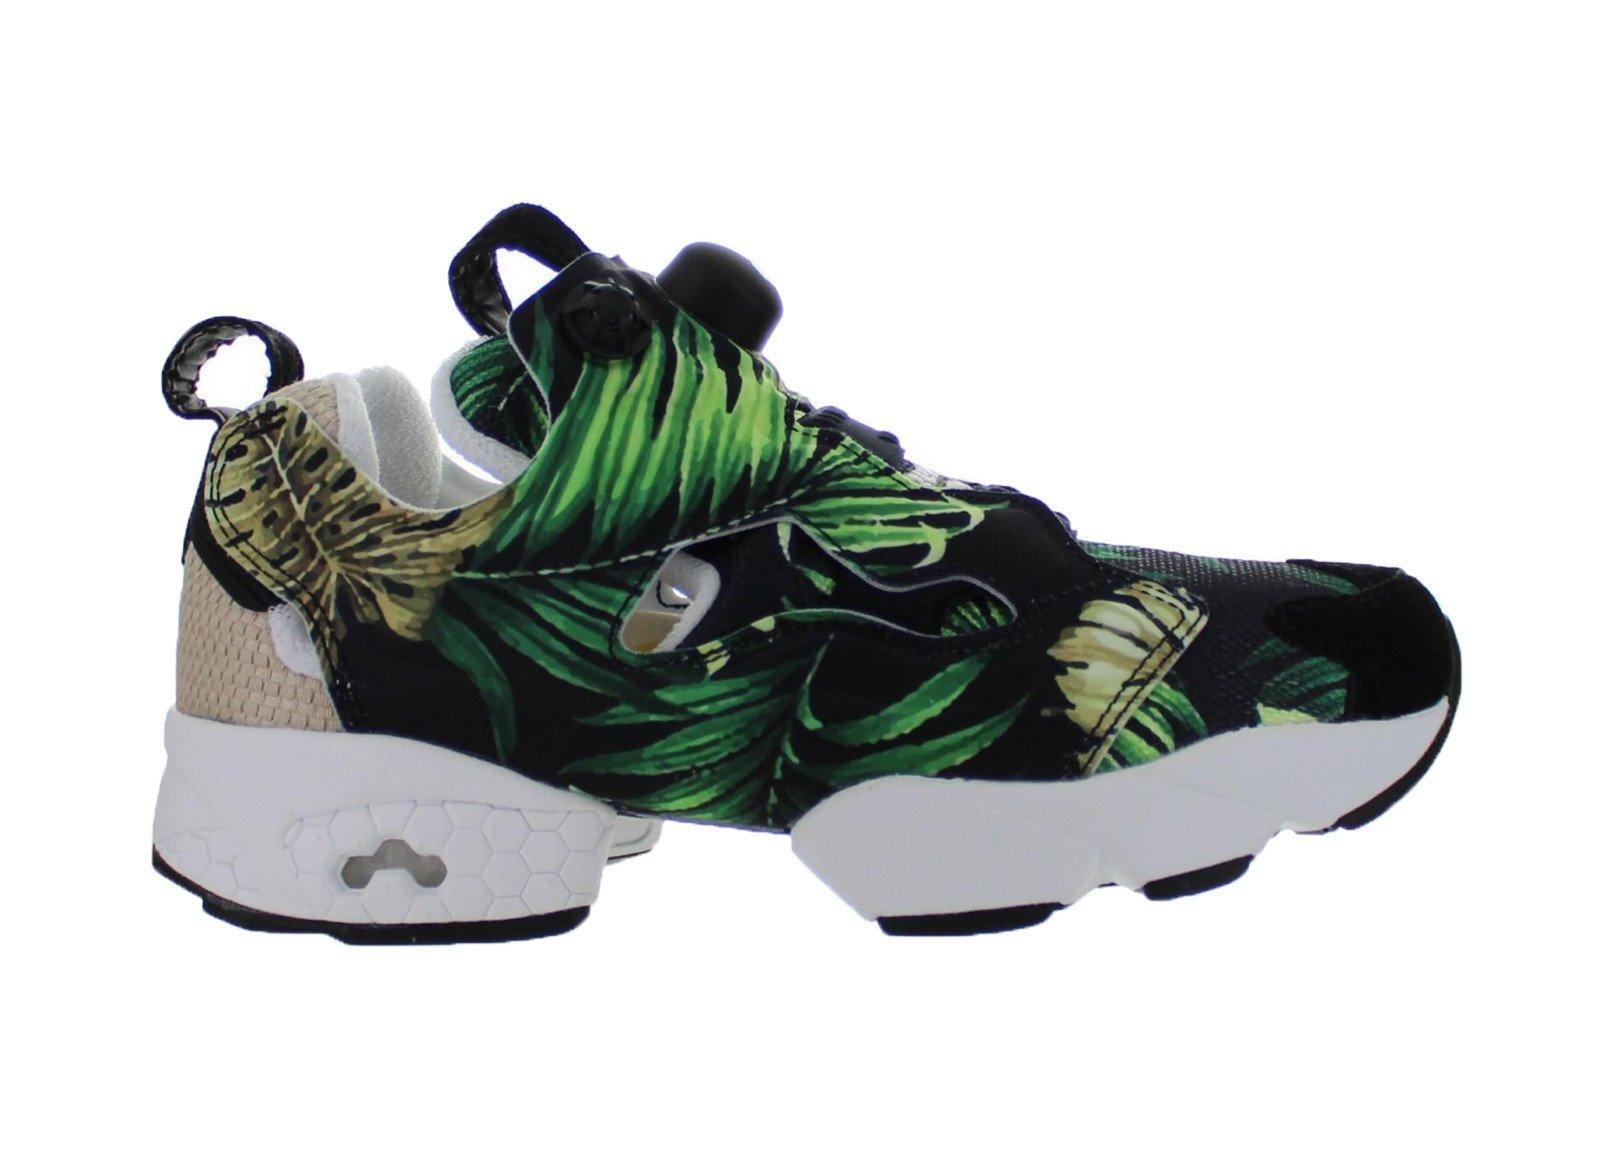 6579a9736d0c Reebok Instapump Fury JG Classic Women s Shoes Size 5.5  0889768122557   Amazon.com  Books